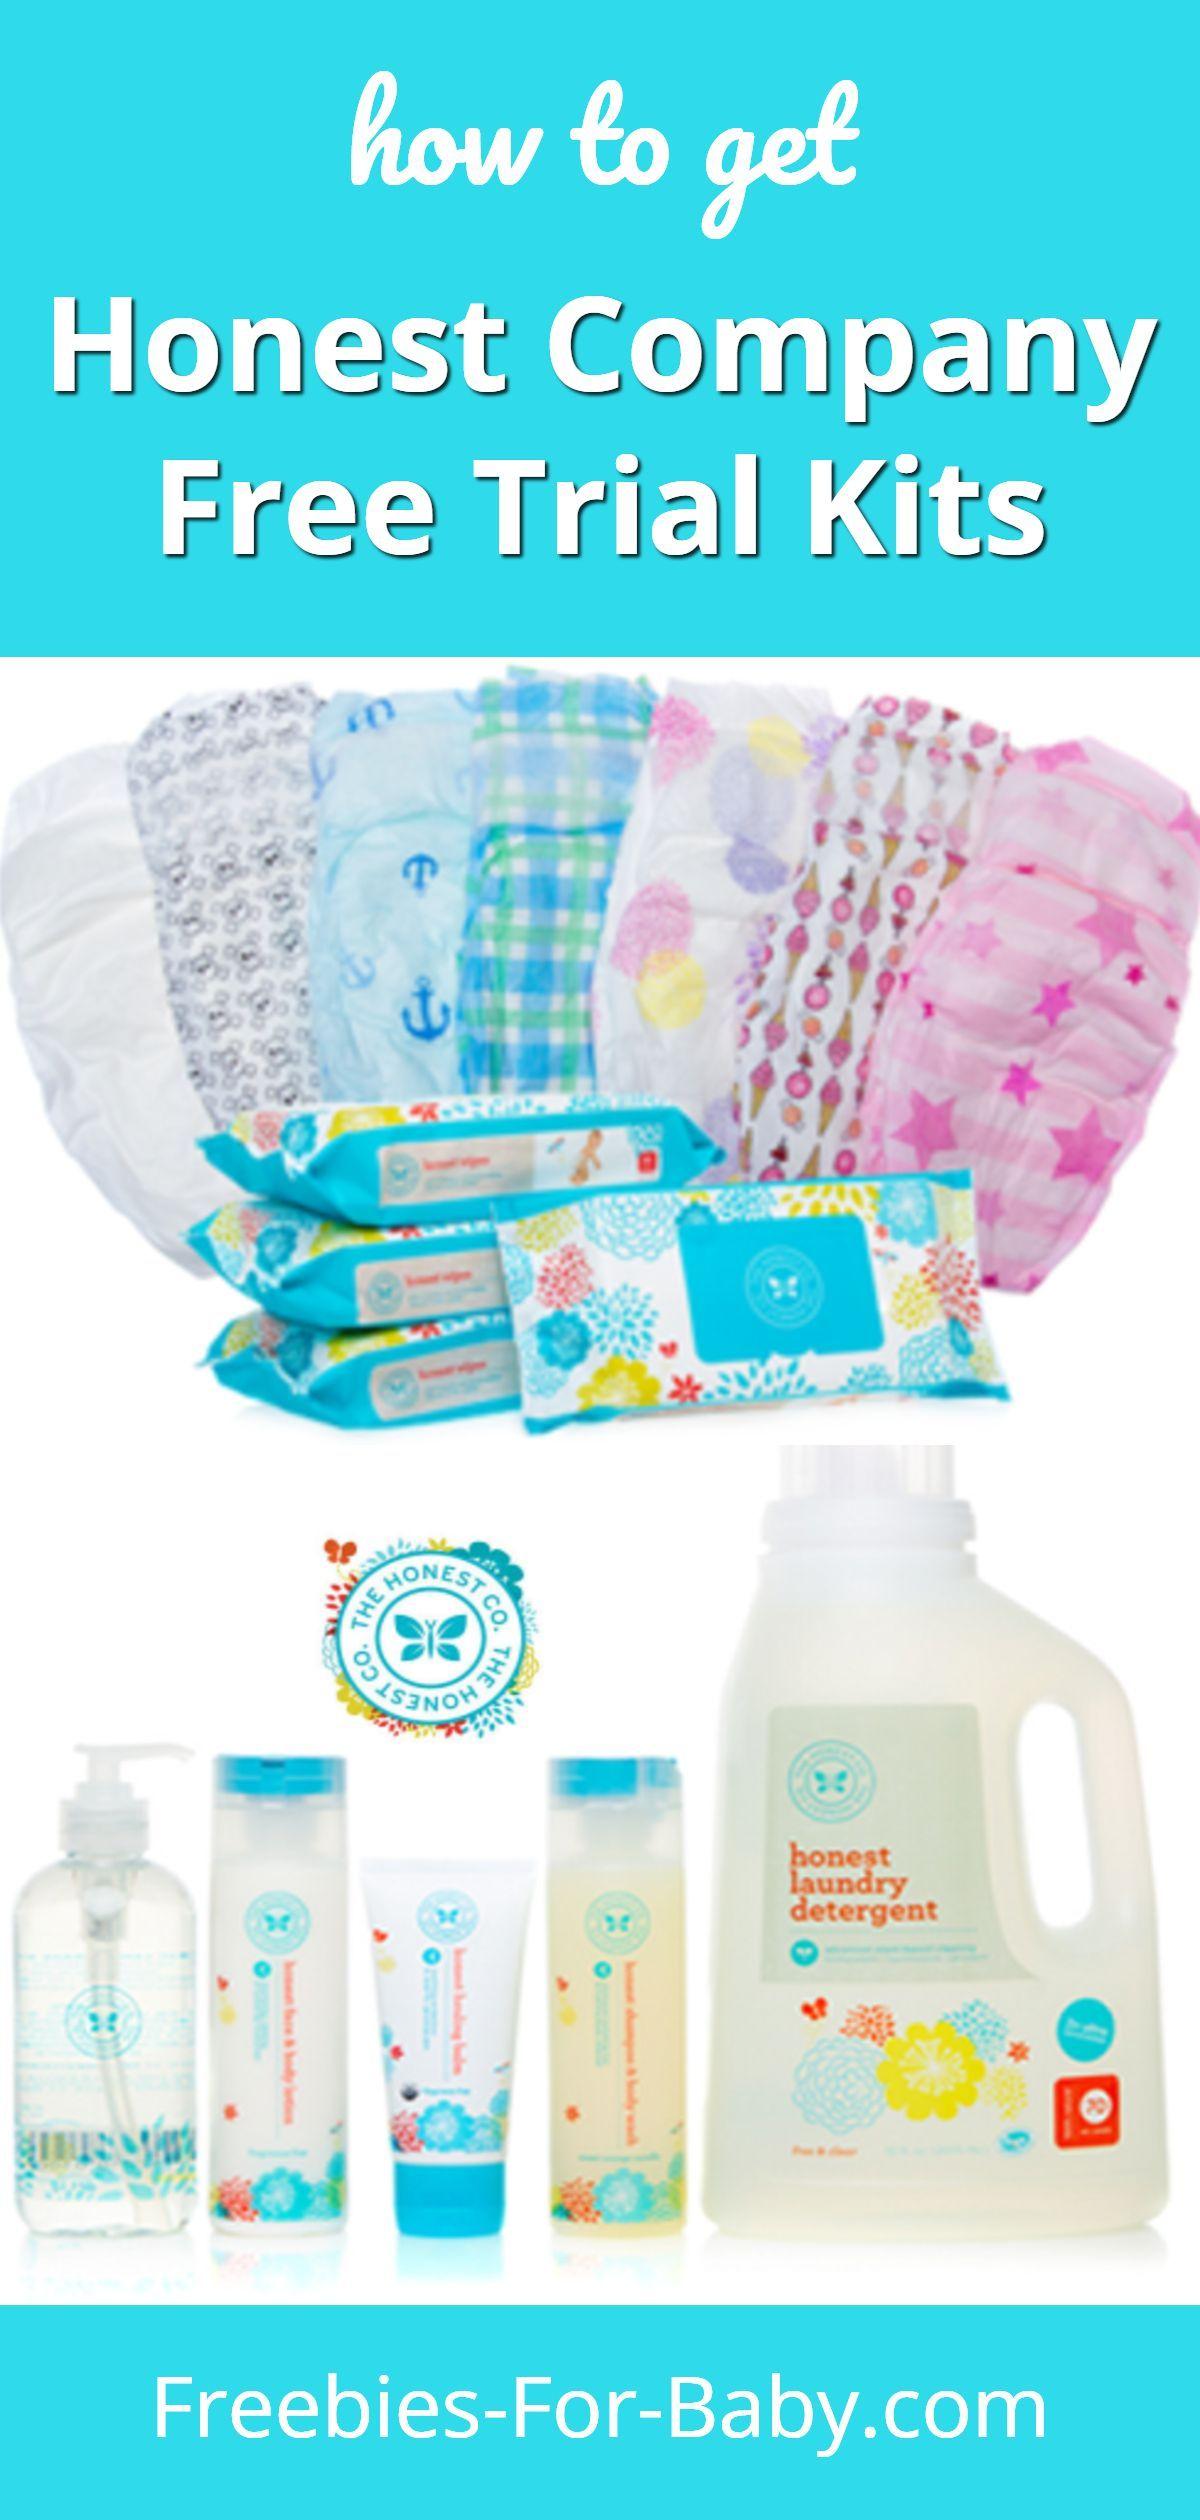 The Honest Company: Free Diapers & Baby Care Products -  Honest Company Diapers – get free trial kits of Honest Company diapers, plus free Honest Co baby  - #Baby #babycaretips #Care #company #diapers #Foodietravel #free #homeschoolingideas #honest #Honeymoon #kidssnacks #Products